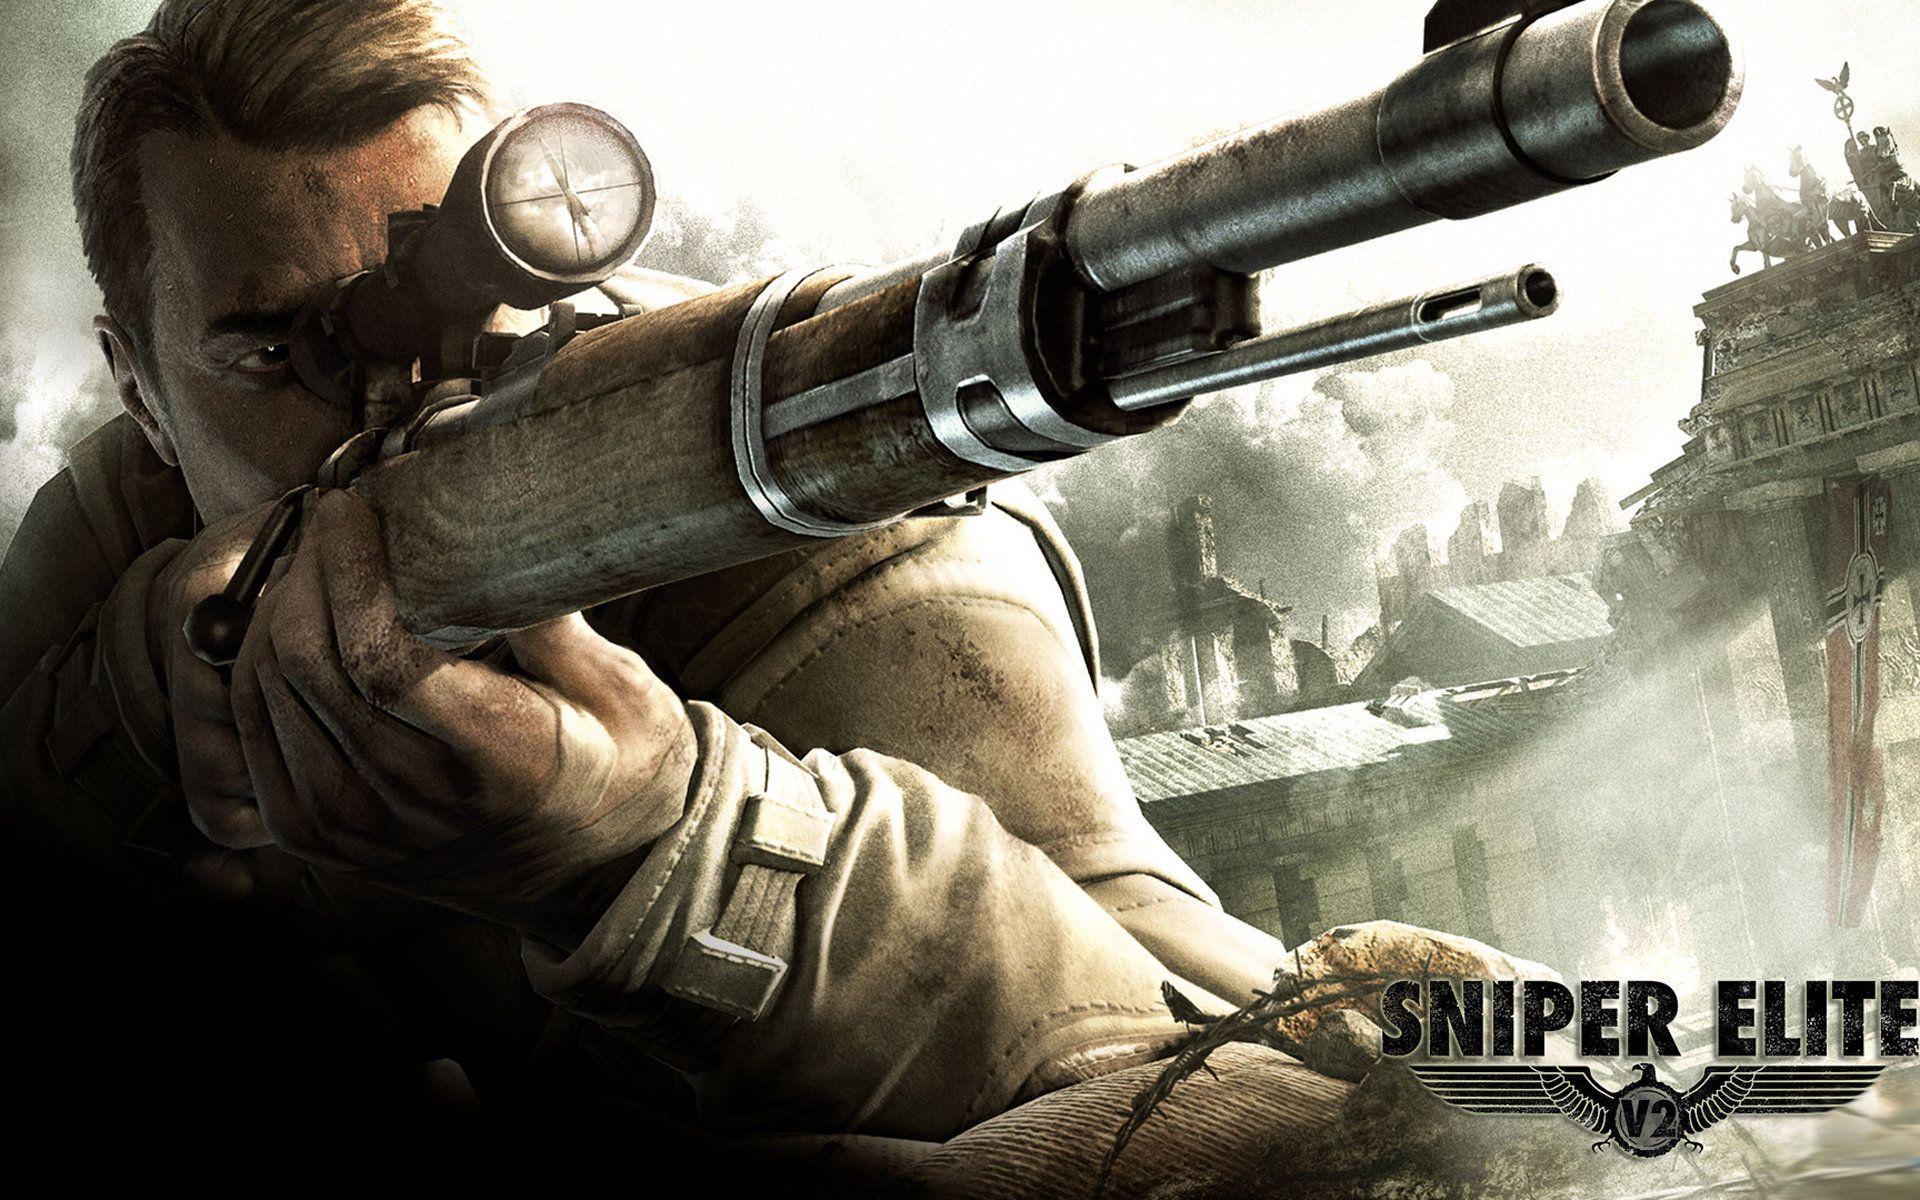 Sniper Elite V2 Wallpapers Top Free Sniper Elite V2 Backgrounds Wallpaperaccess